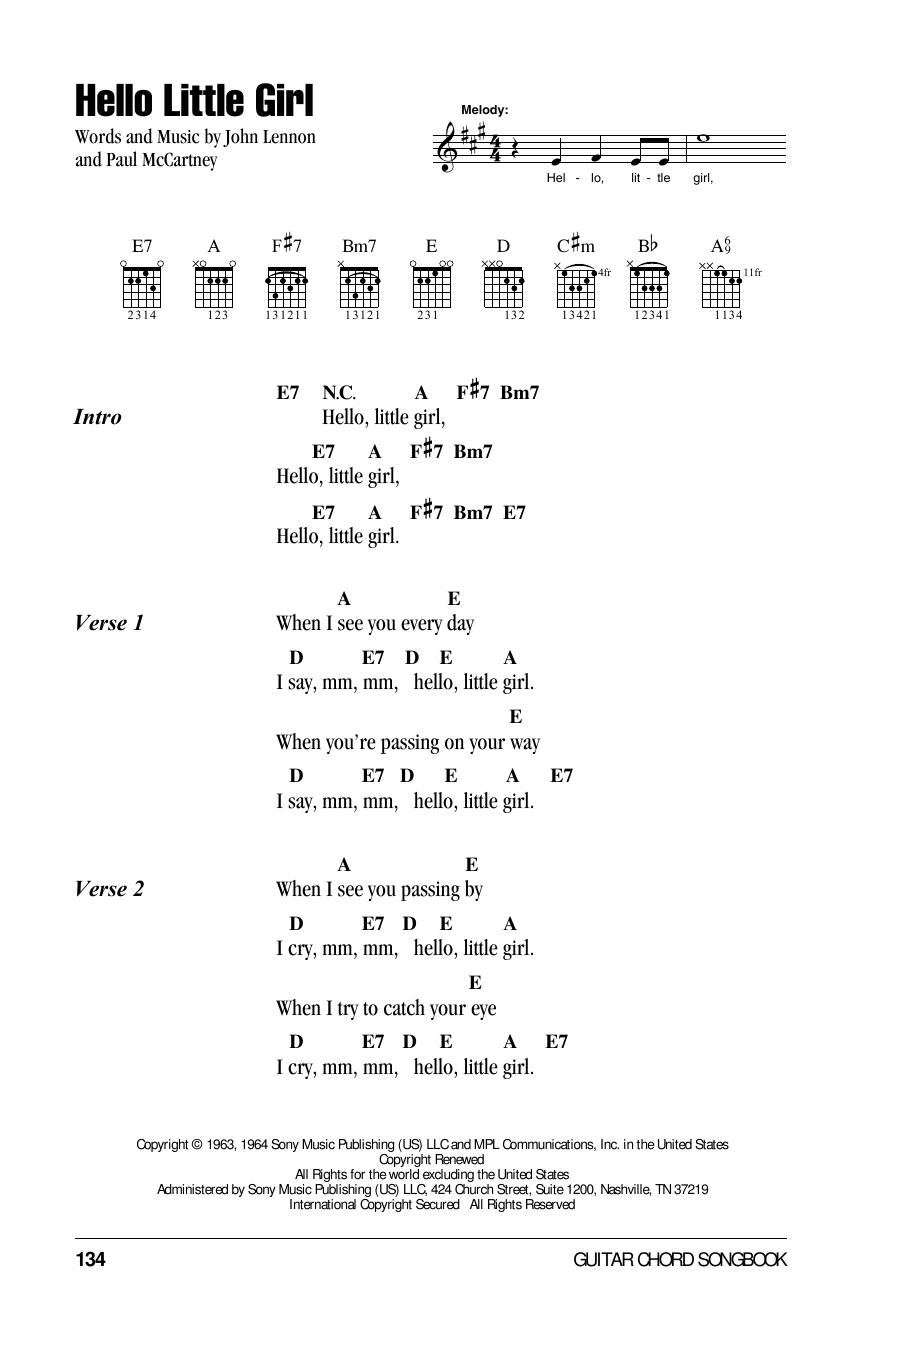 Hello Little Girl Sheet Music By The Beatles Lyrics Chords 78453